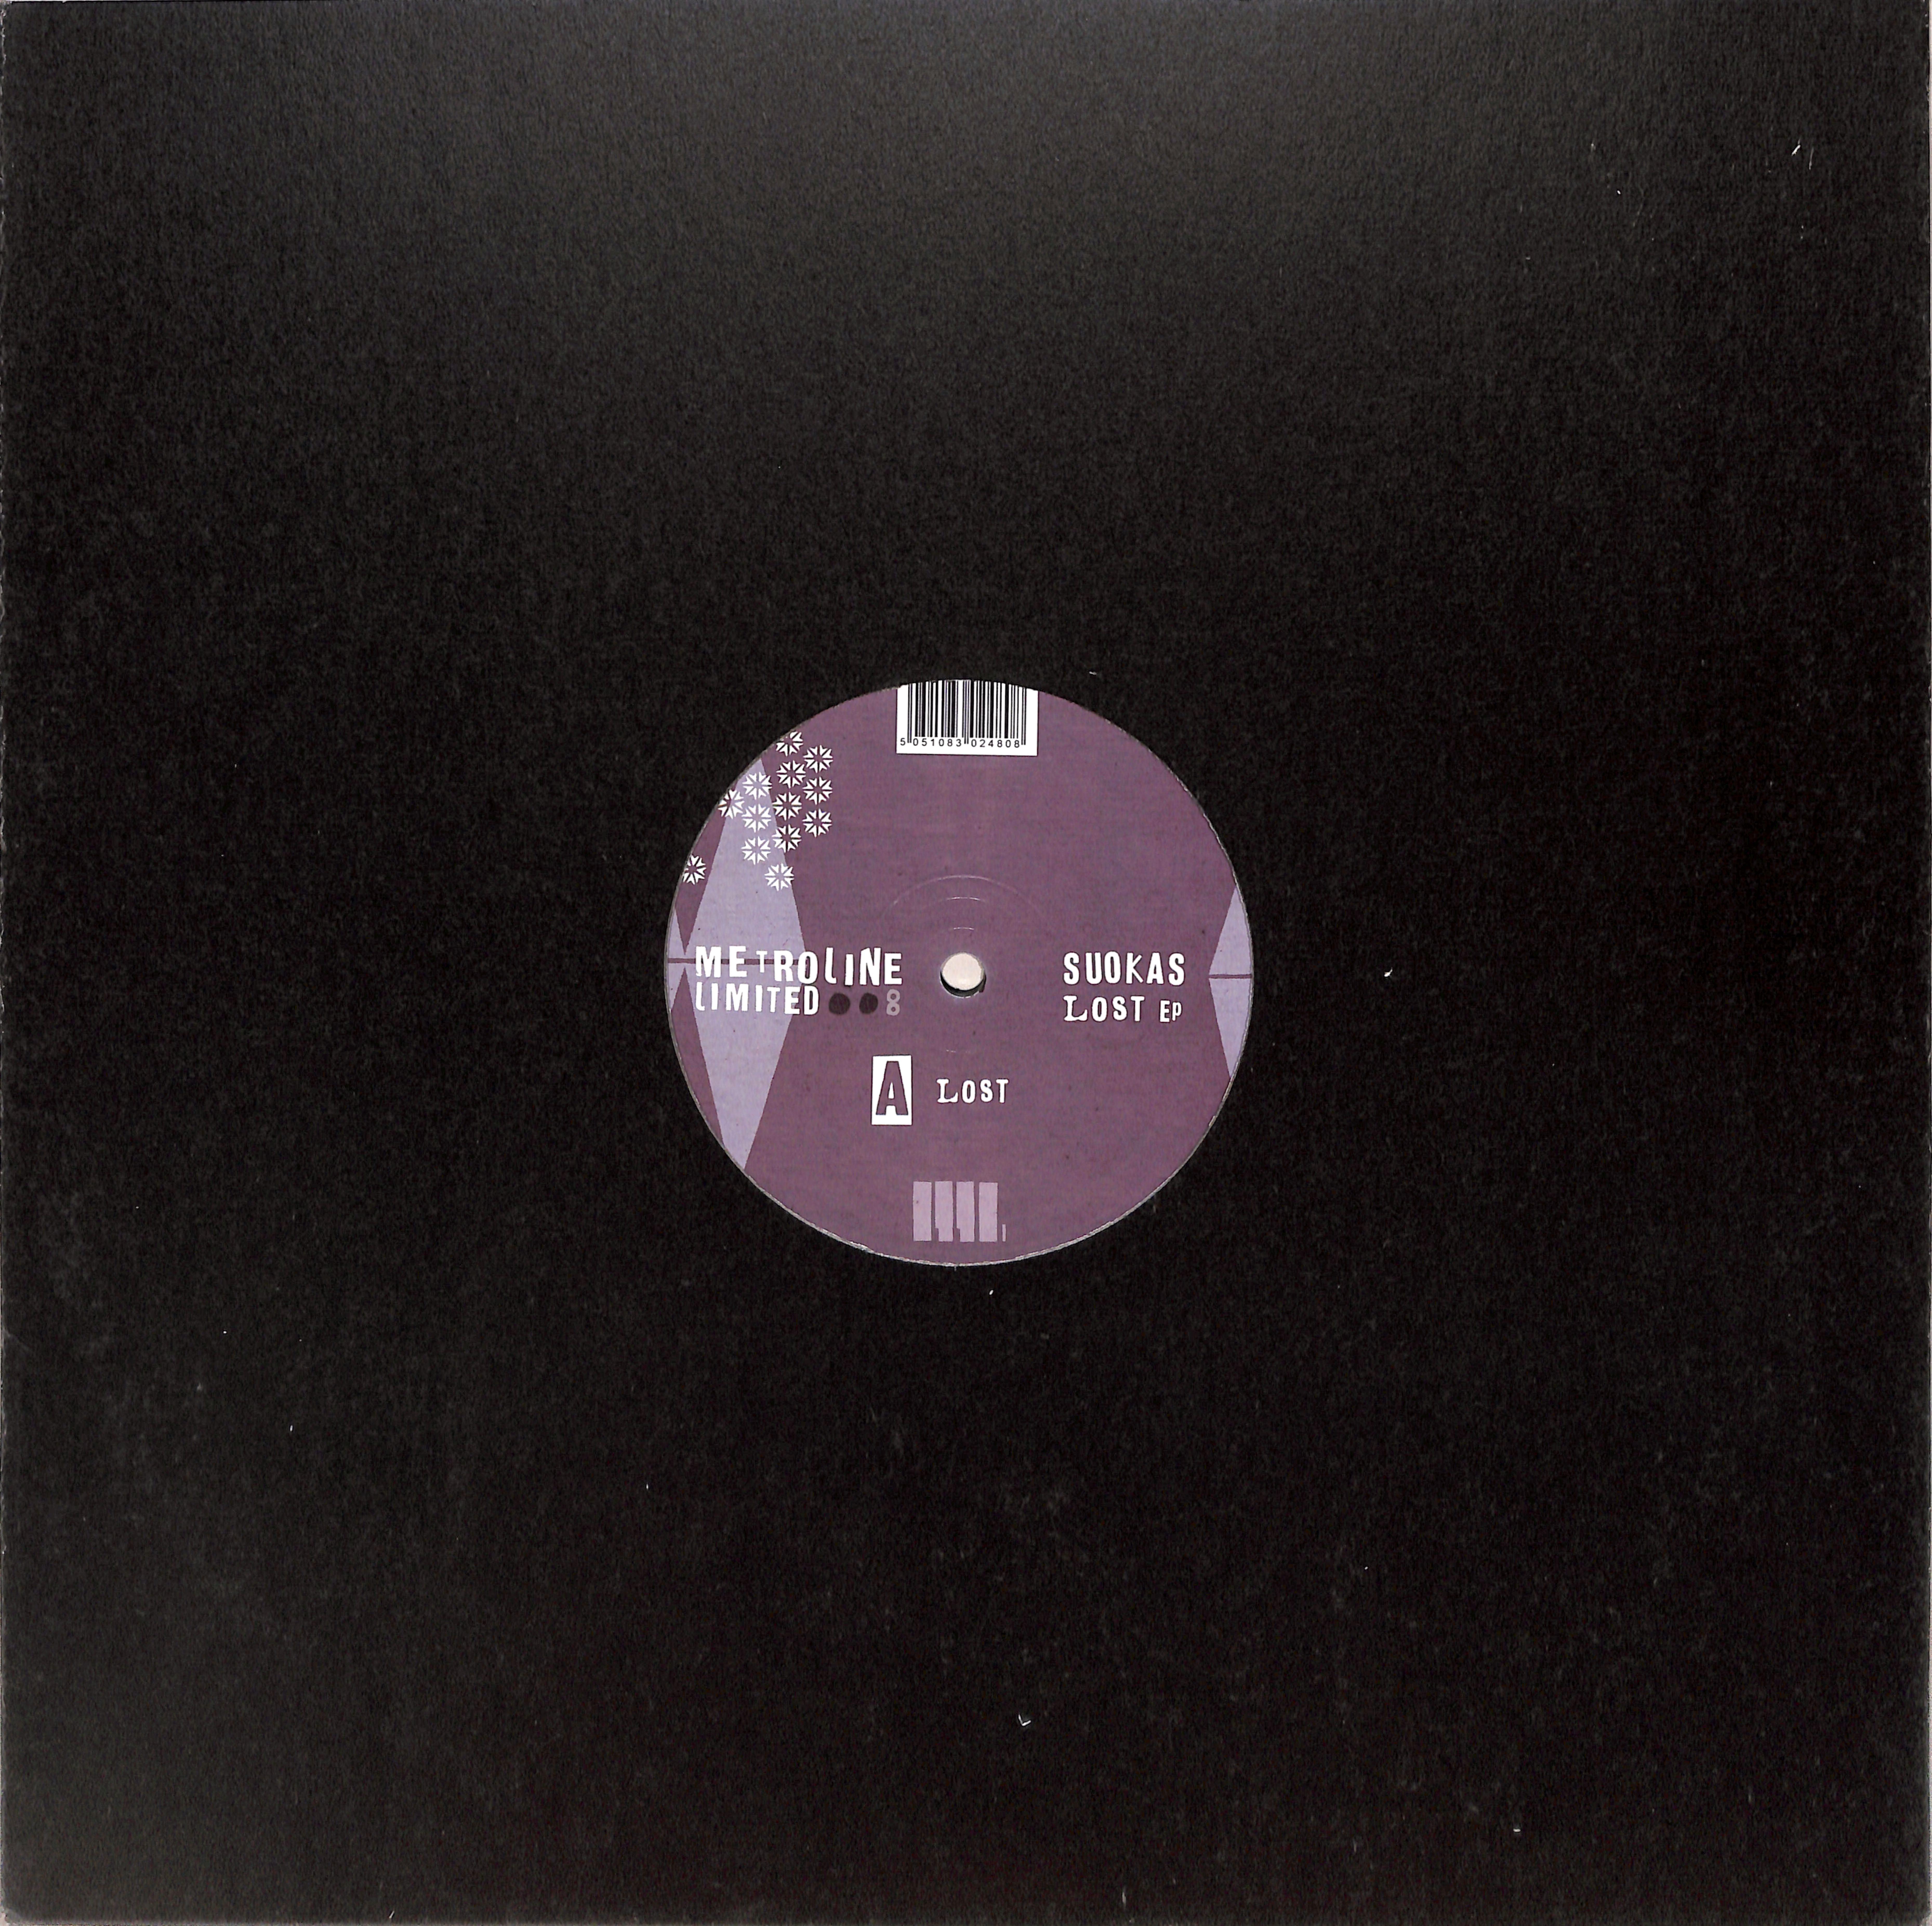 Suokas - LOST EP